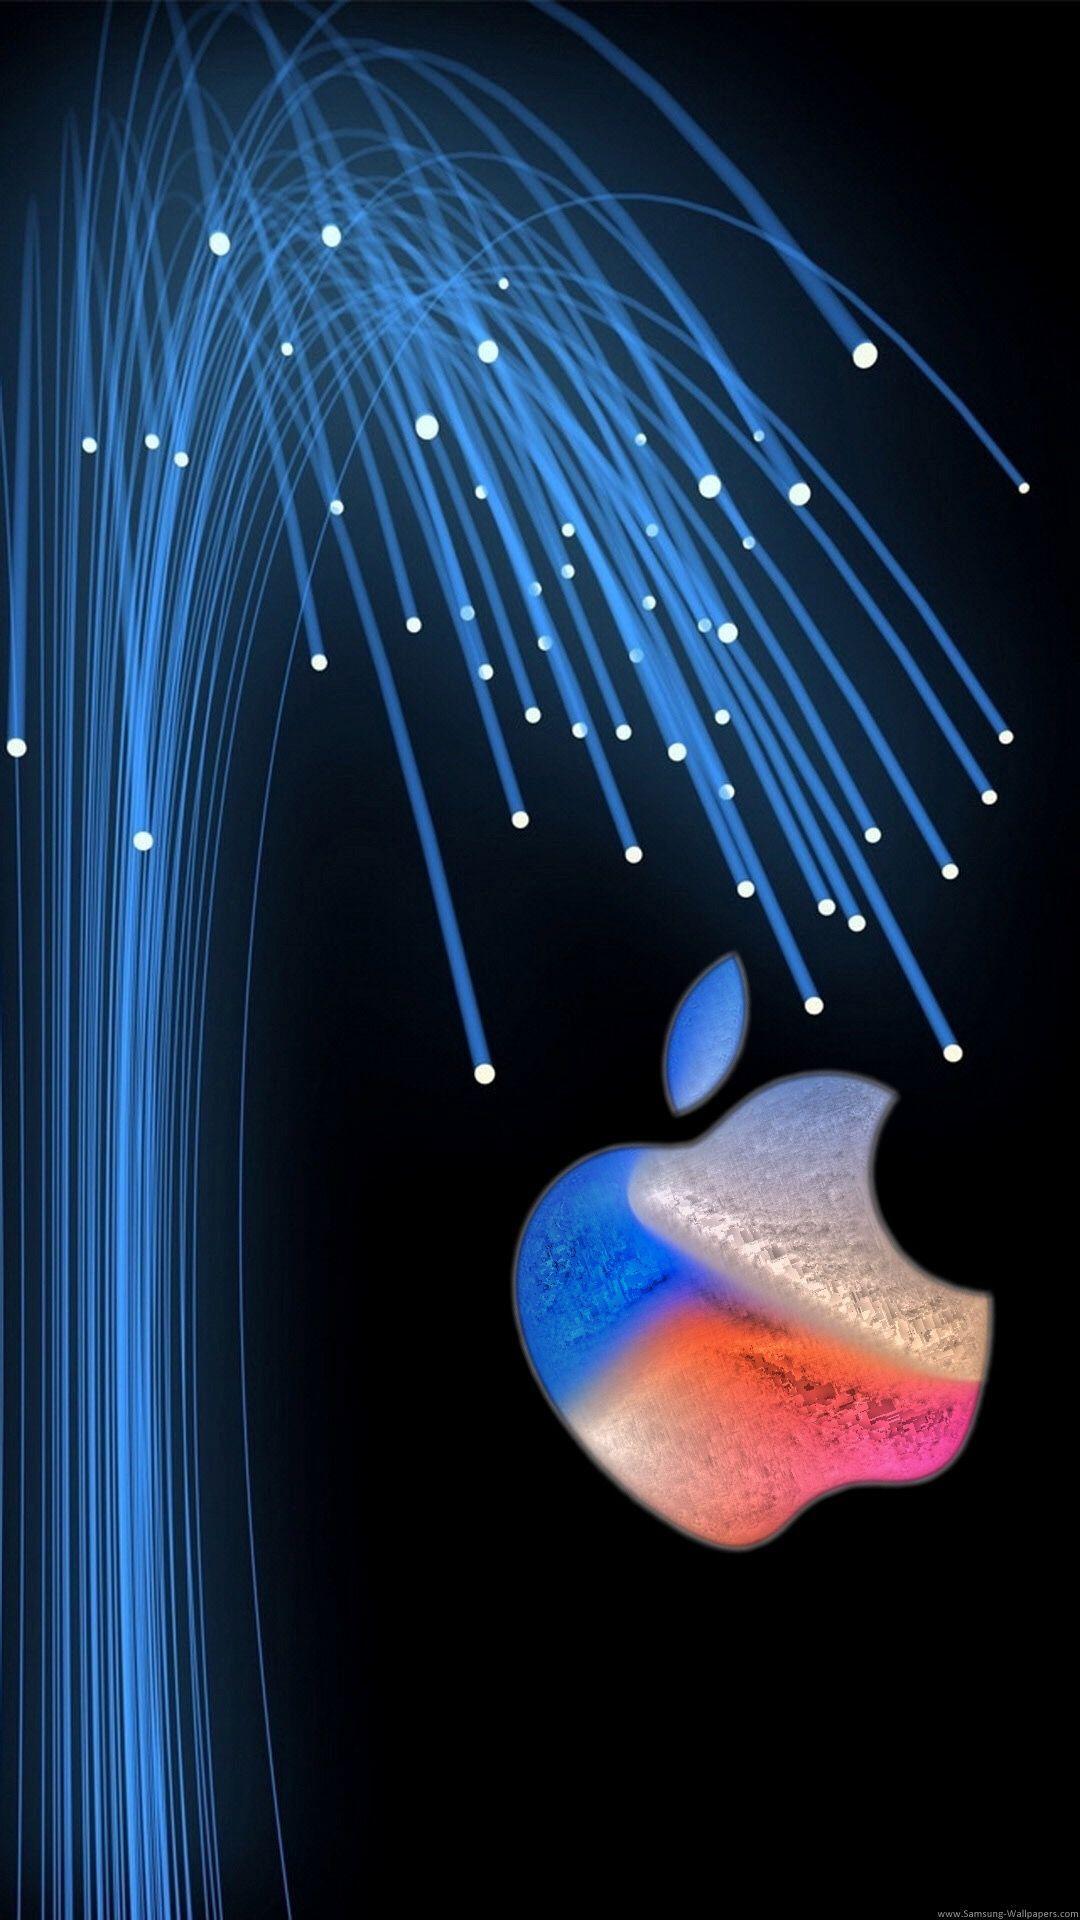 Samsung Galaxy Note 10 1 Paling Unggul Di Kelasnya Applewallpaperiphone Lakaluka Di 2020 Latar Belakang Ilustrasi 3d Wallpaper Ponsel